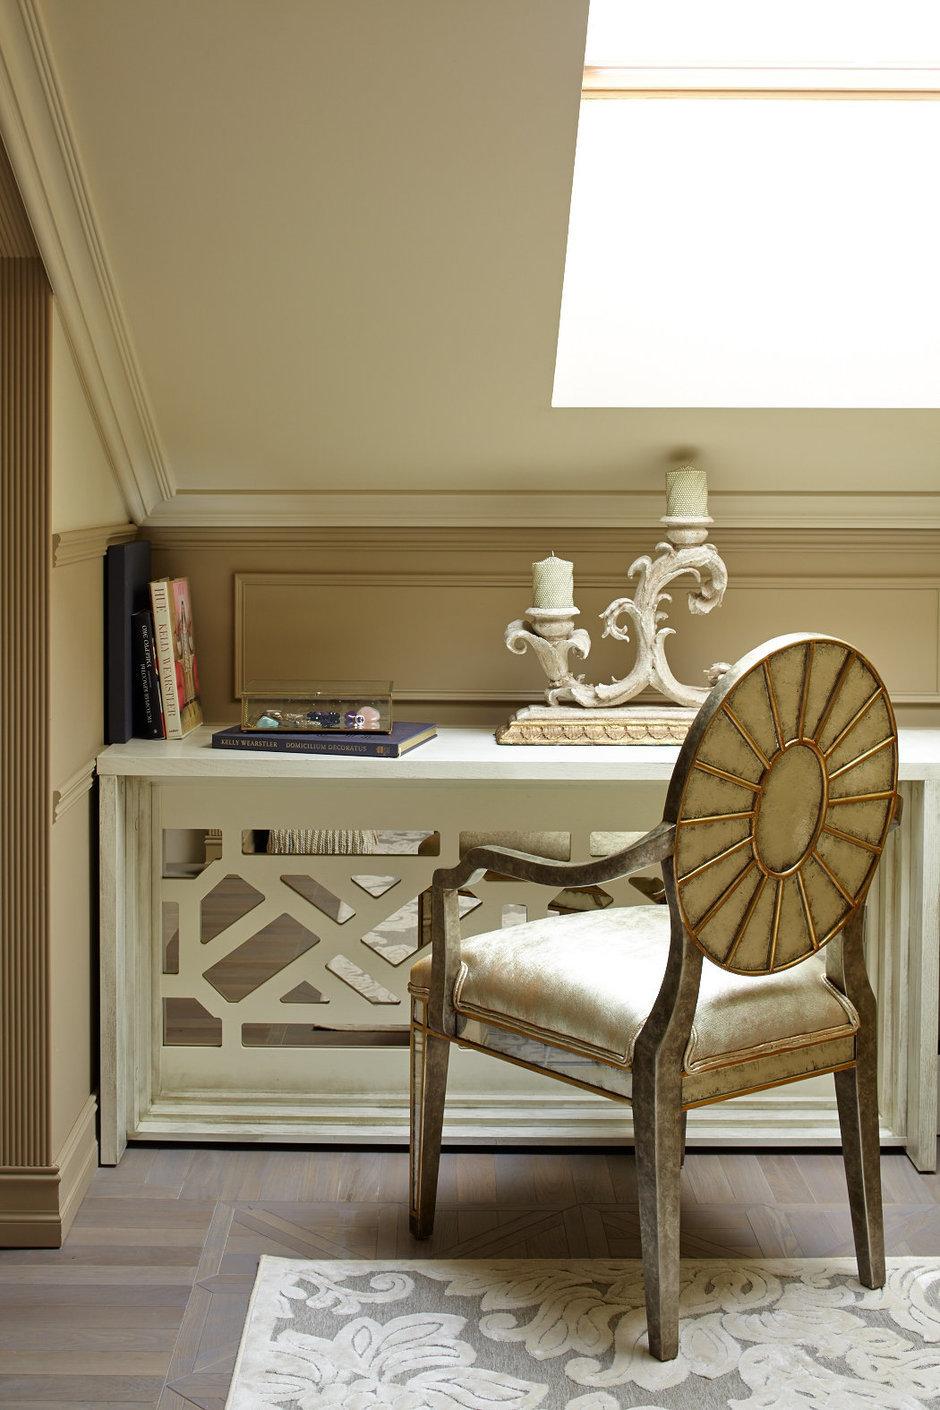 Фотография: Офис в стиле , Классический, Эклектика, Квартира, Текстиль, Дома и квартиры – фото на InMyRoom.ru